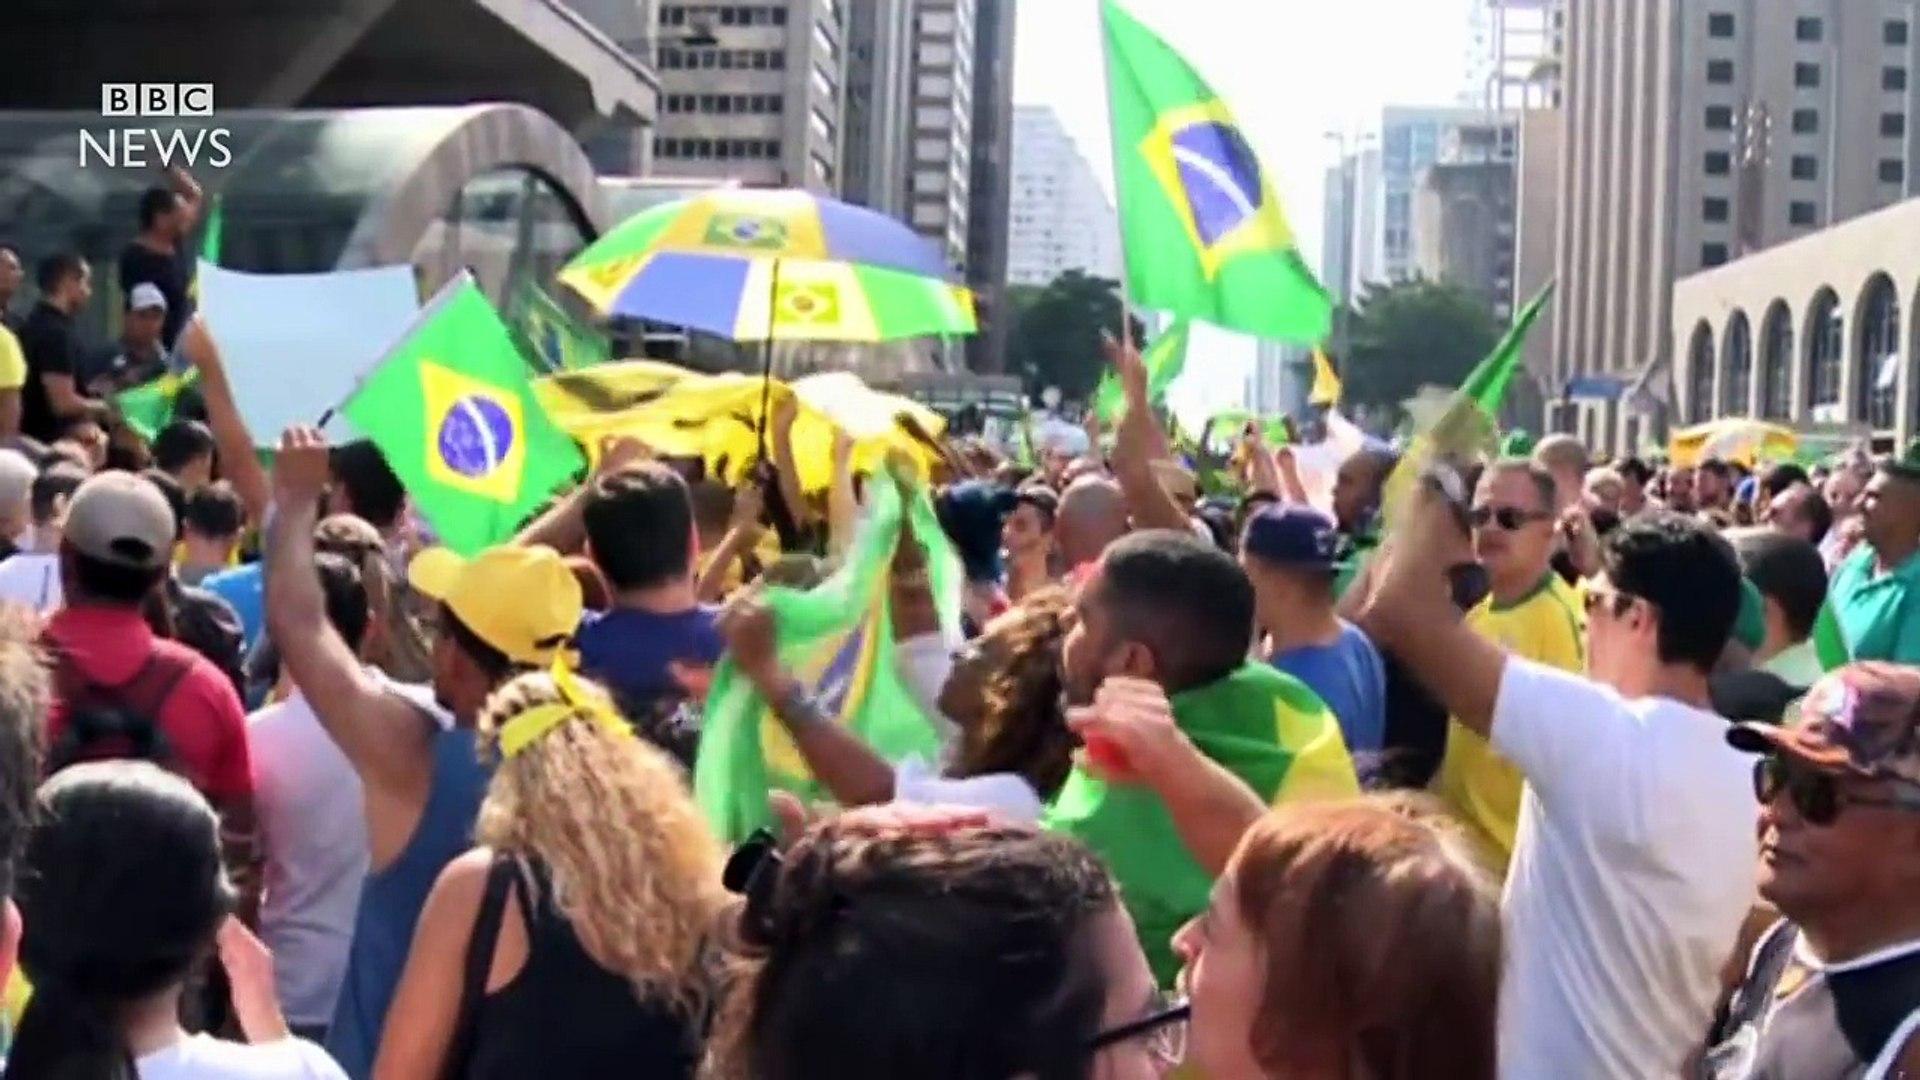 Brazil's deepening political crisis - BBC News